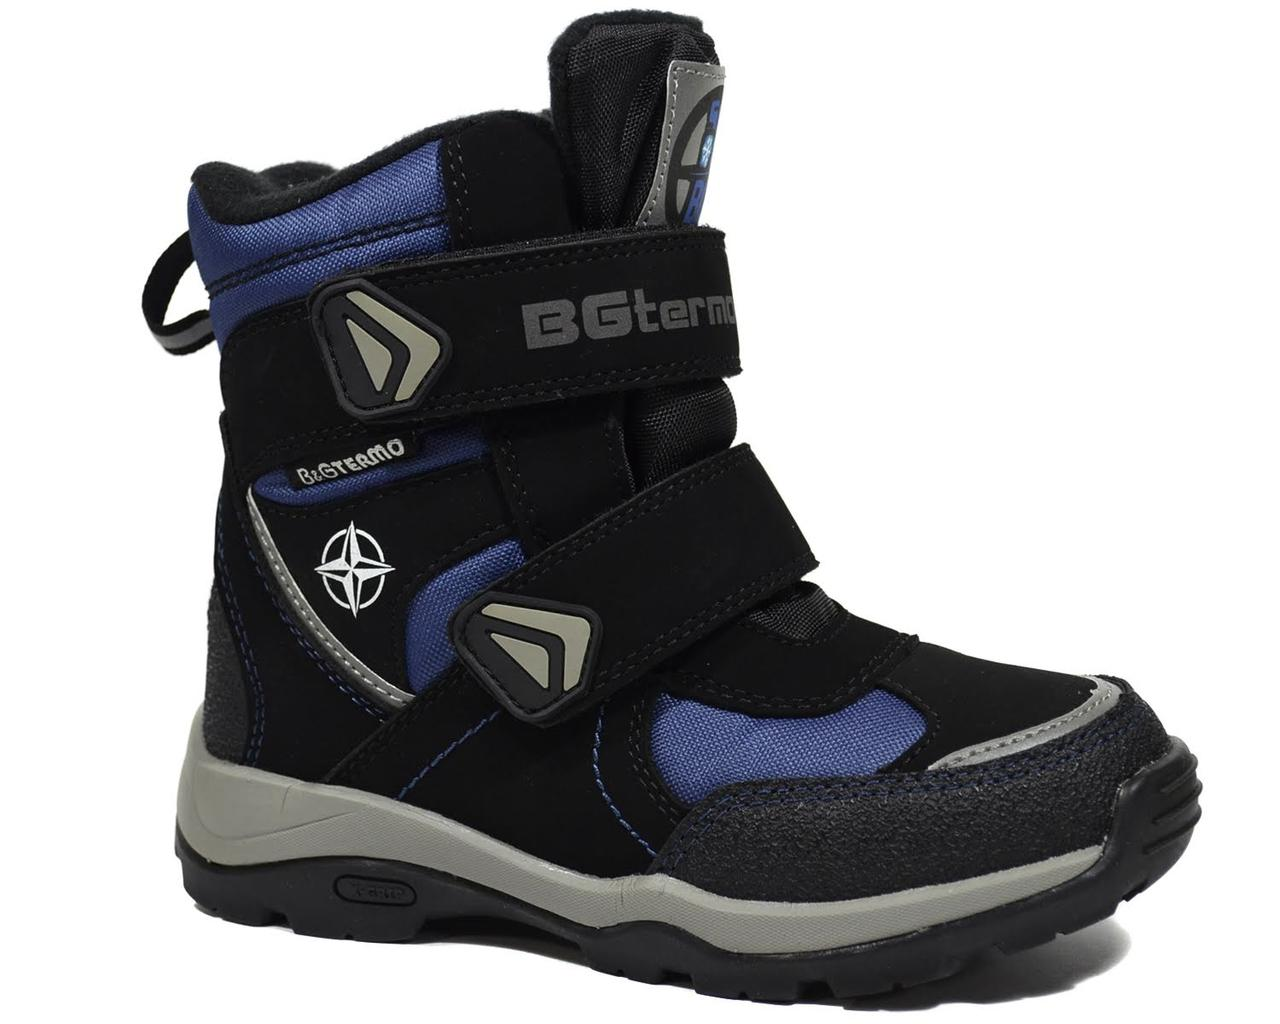 795aa96d8 Детские зимние термо-ботинки для мальчика, B&G-Termo gray-blue, 31 ...